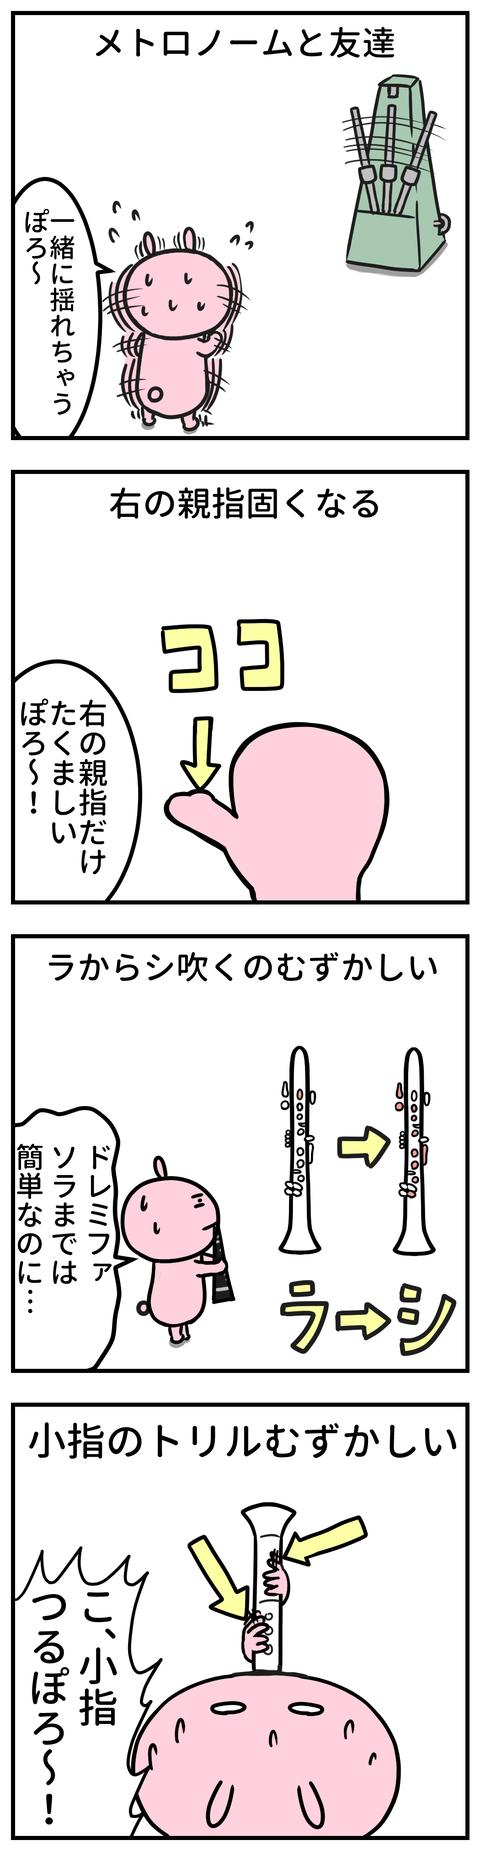 manga-yuzuporo38-1